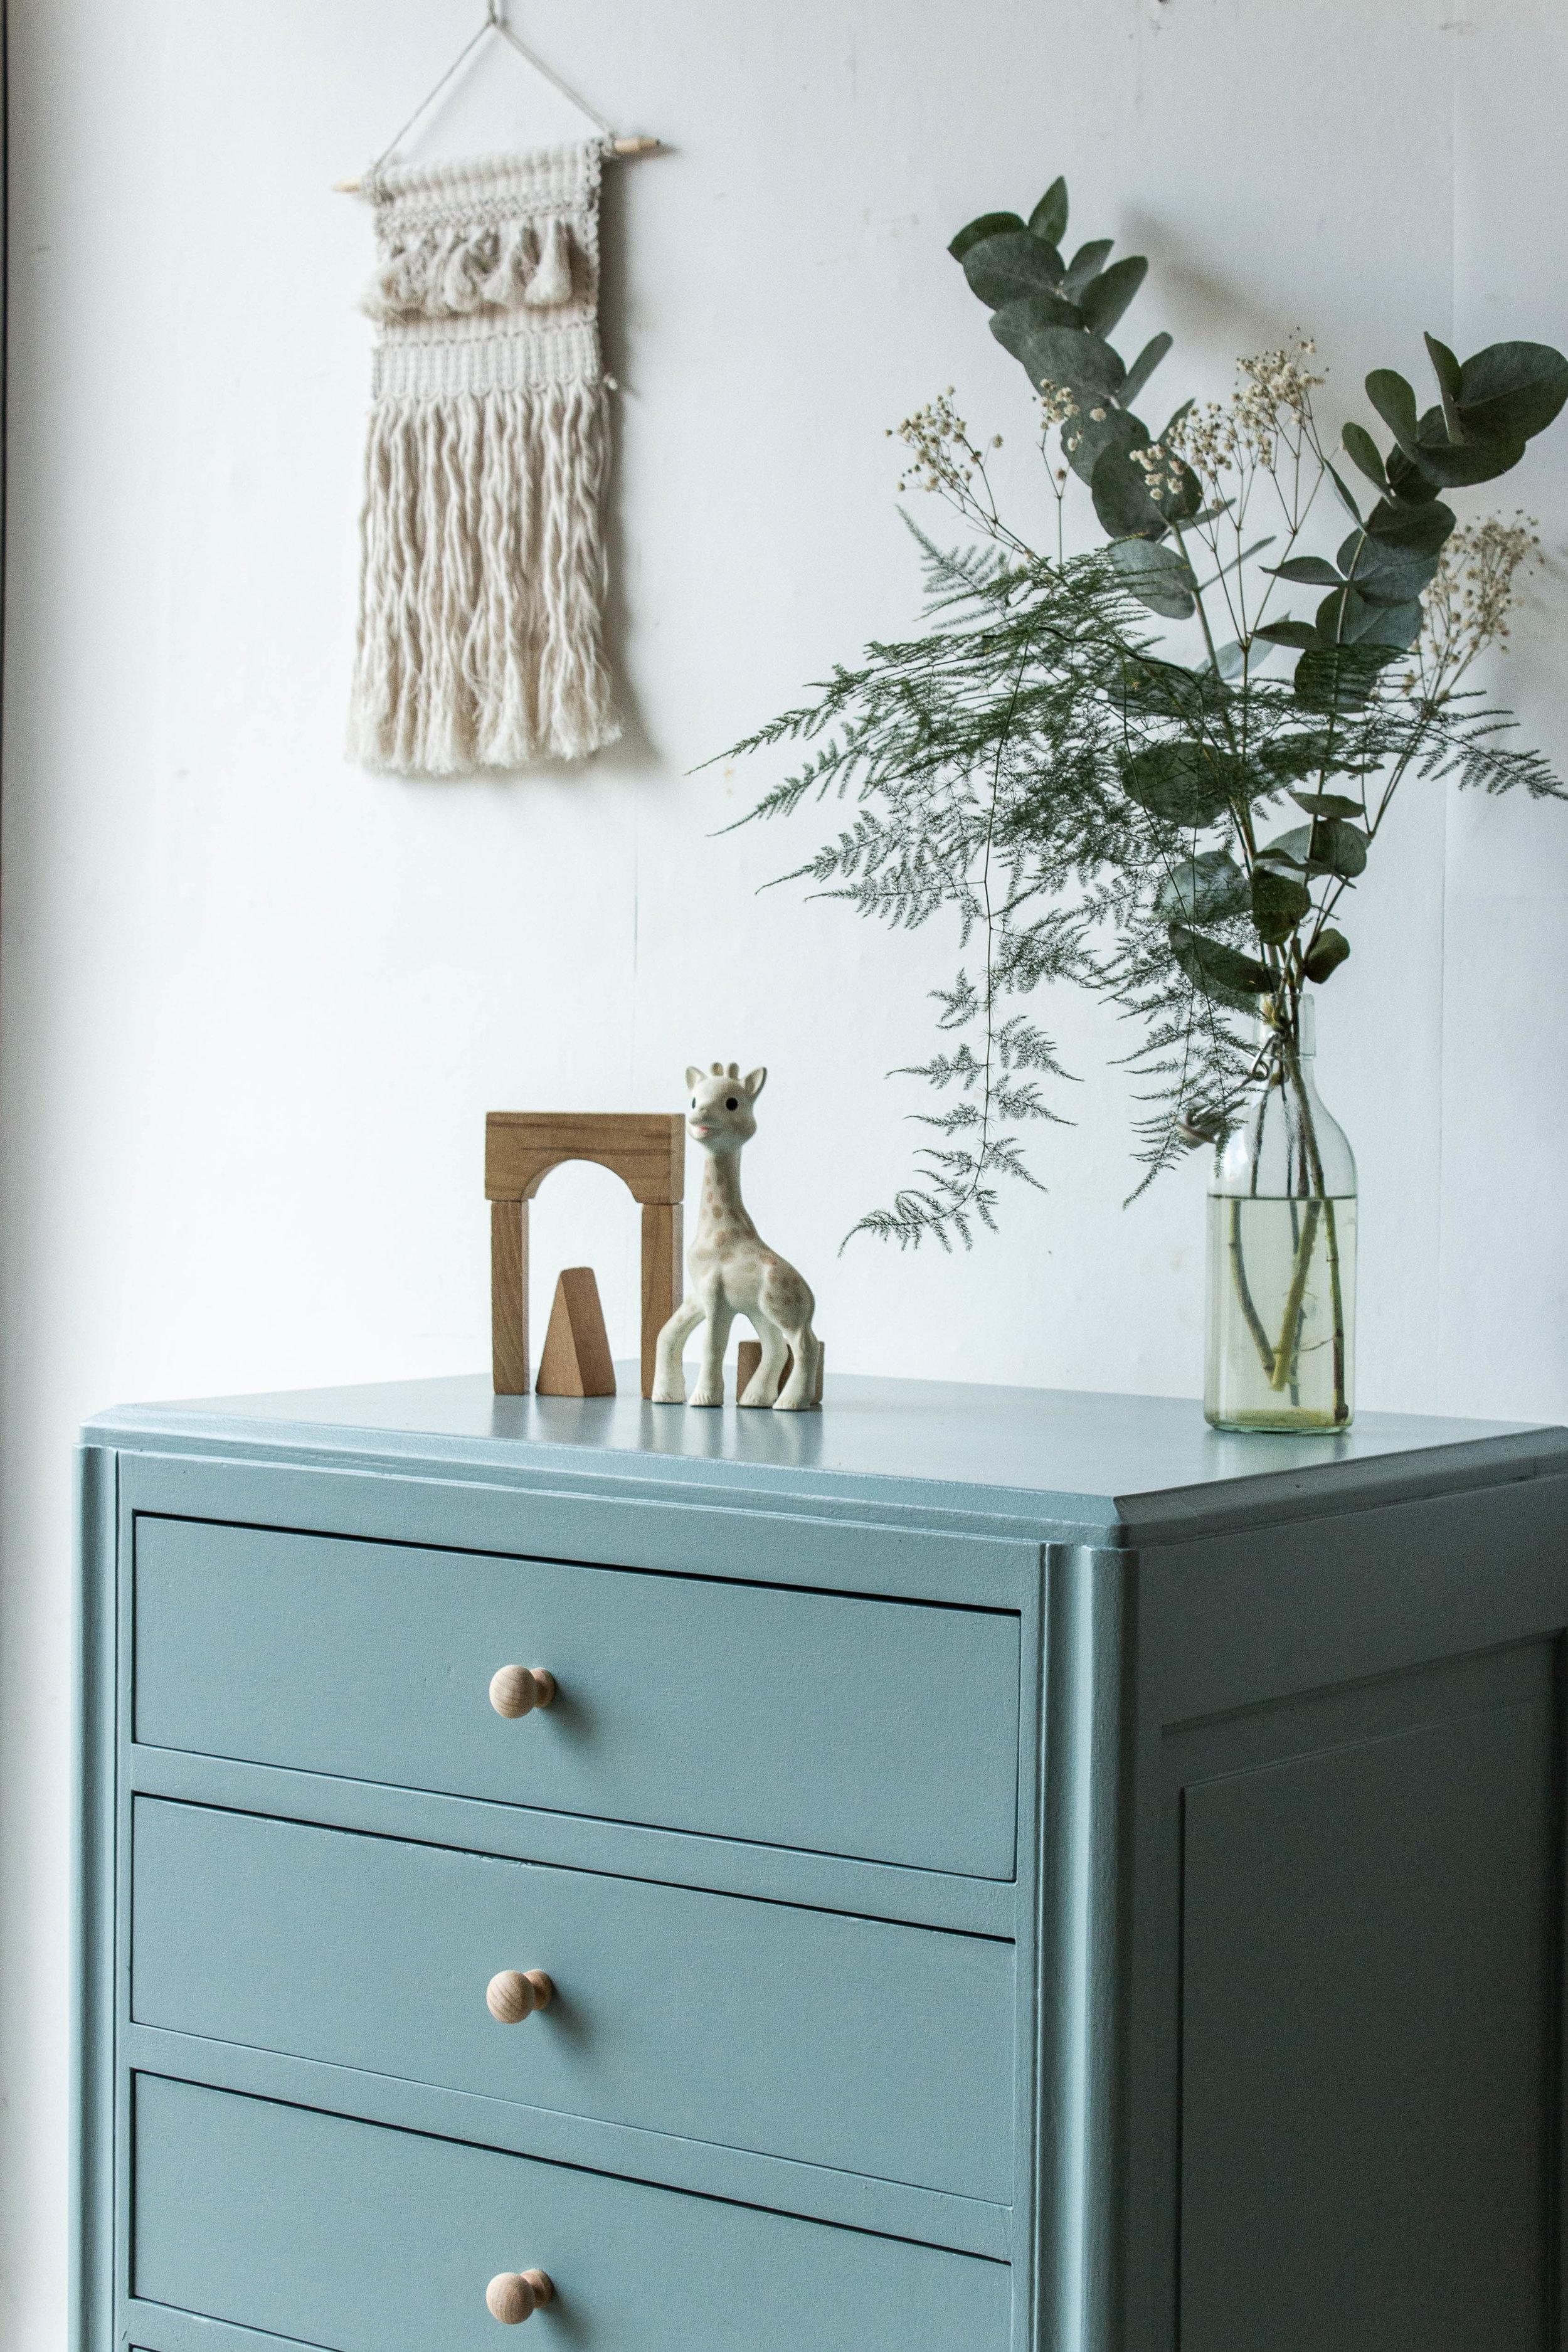 1554 - Grijsblauw vintage ladenkastje-3.jpg